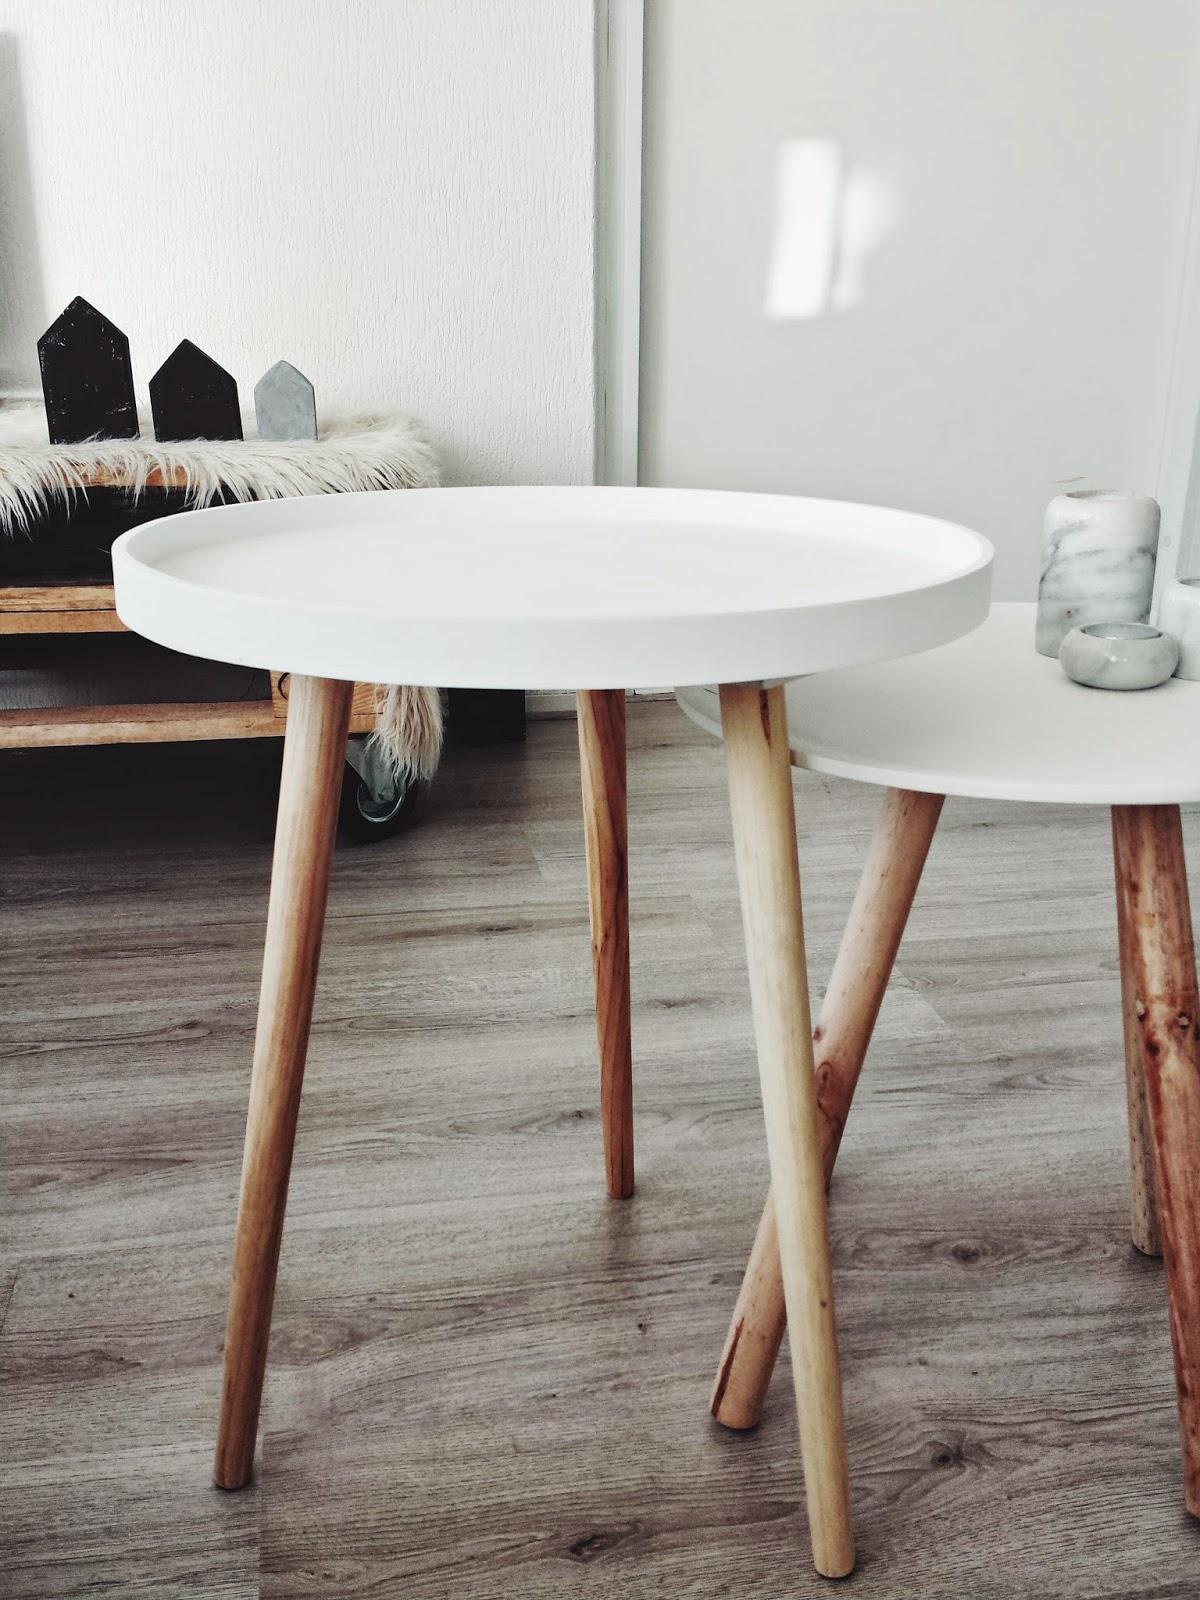 Witte Ronde Tafel : Witte ronde tafel te koop. Witte ronde tafel ...